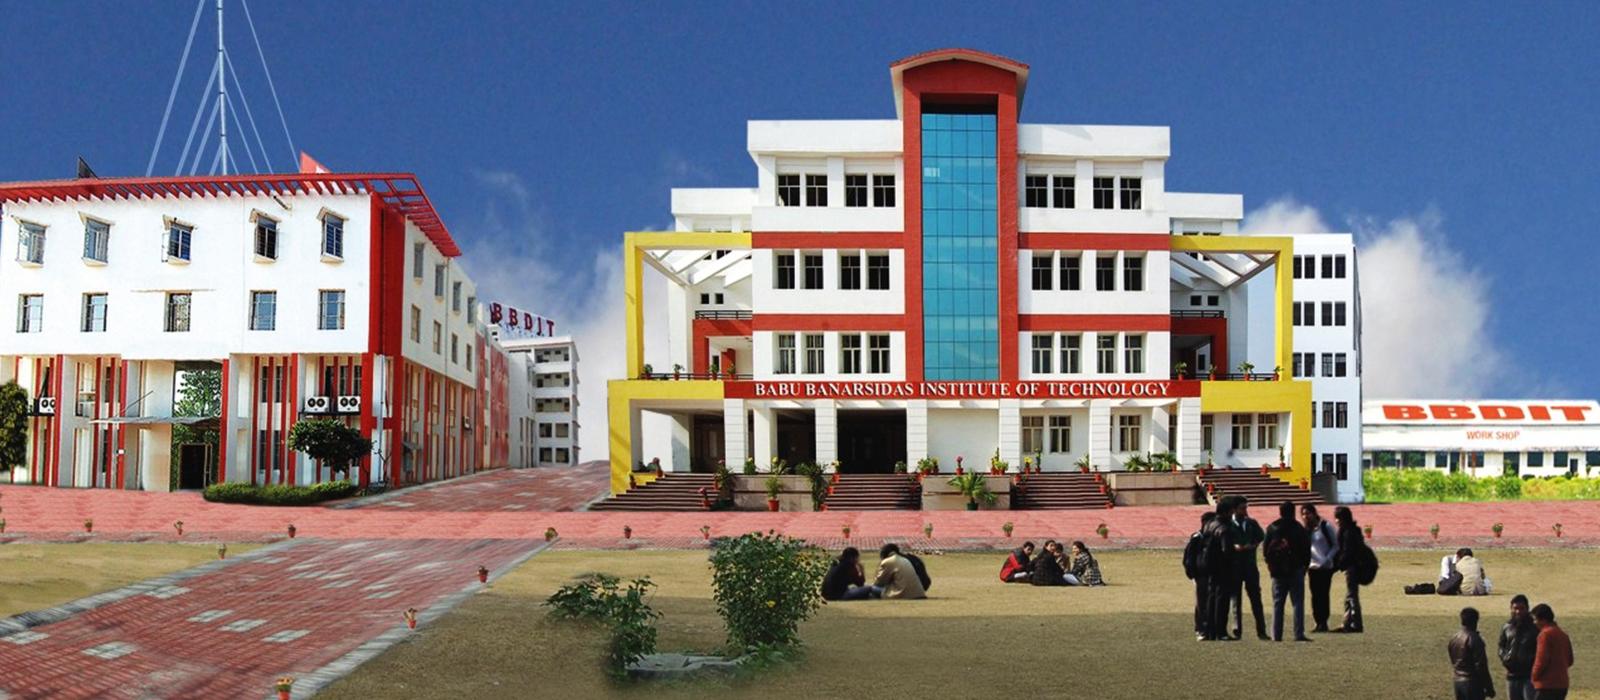 BABU BANARASI DAS INSTITUTE OF TECHNOLOGY, Ghaziabad